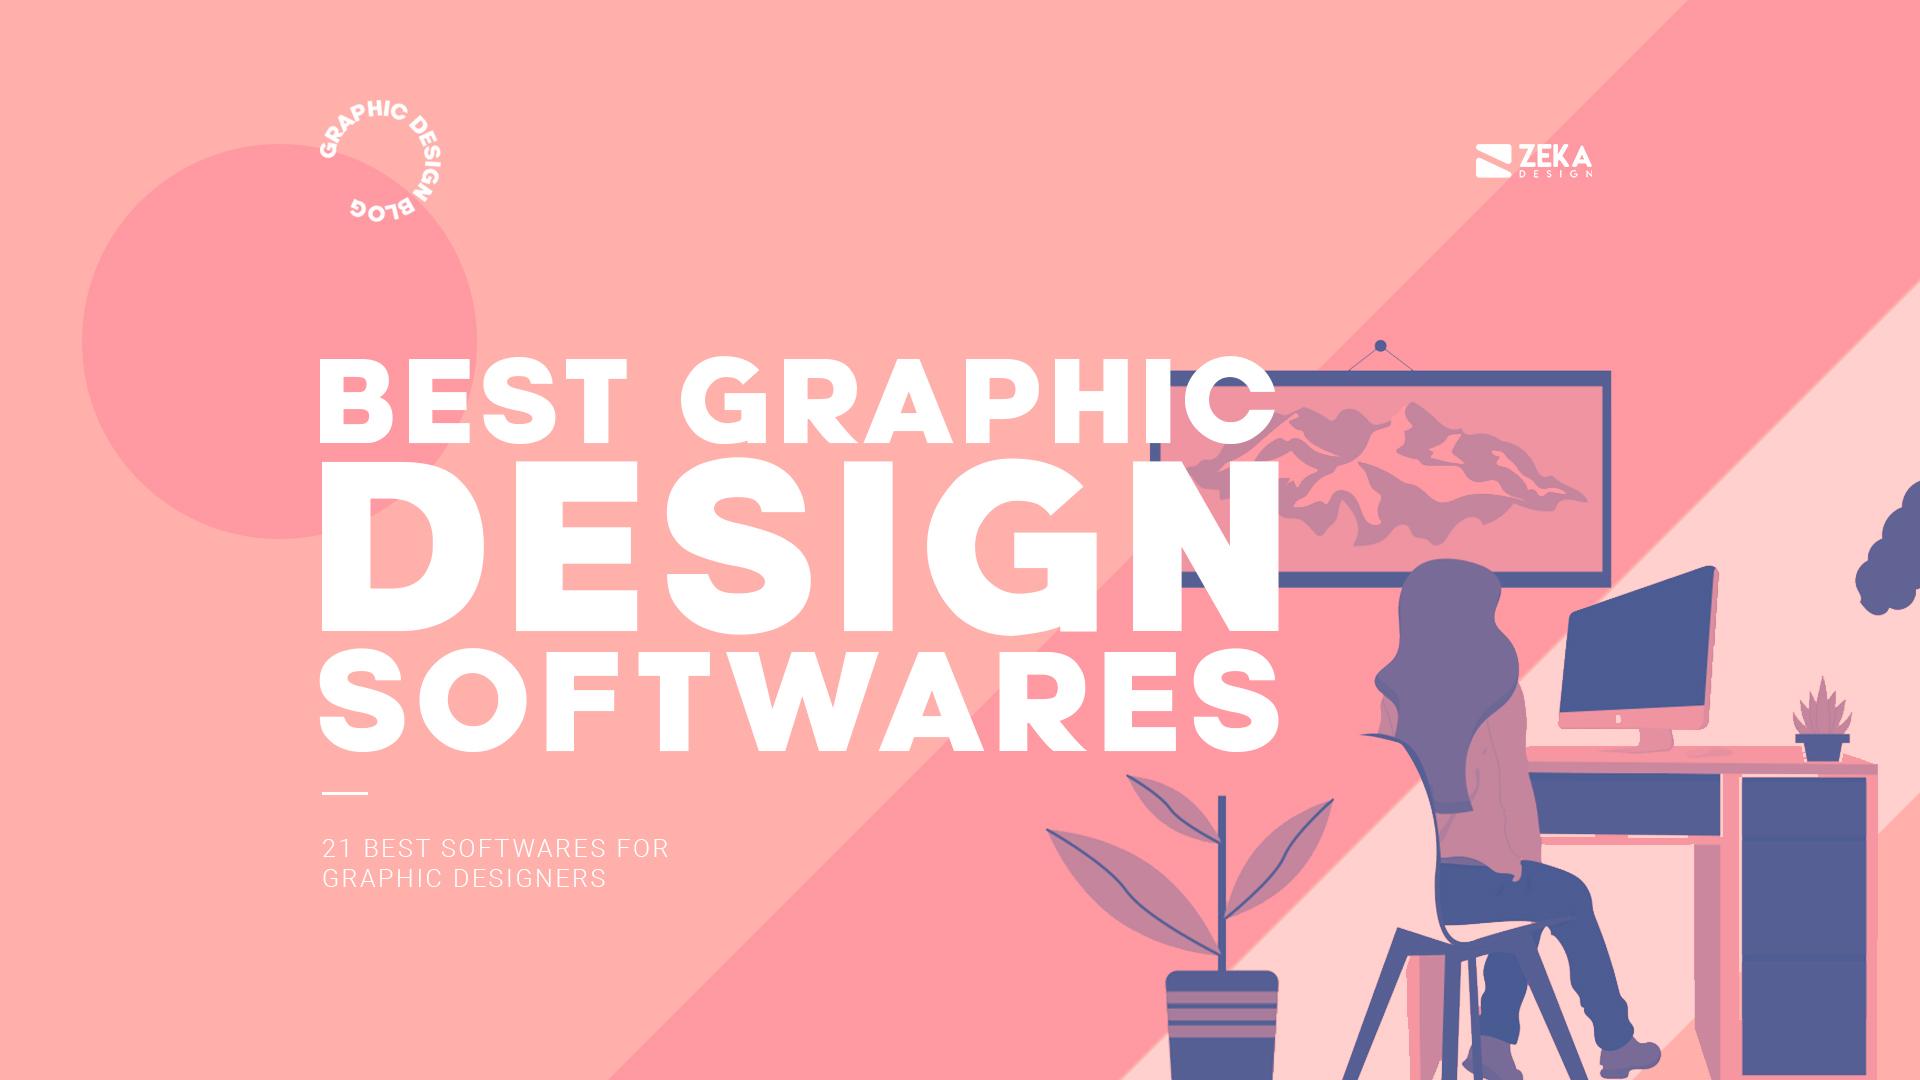 21 Best Graphic Design Softwares